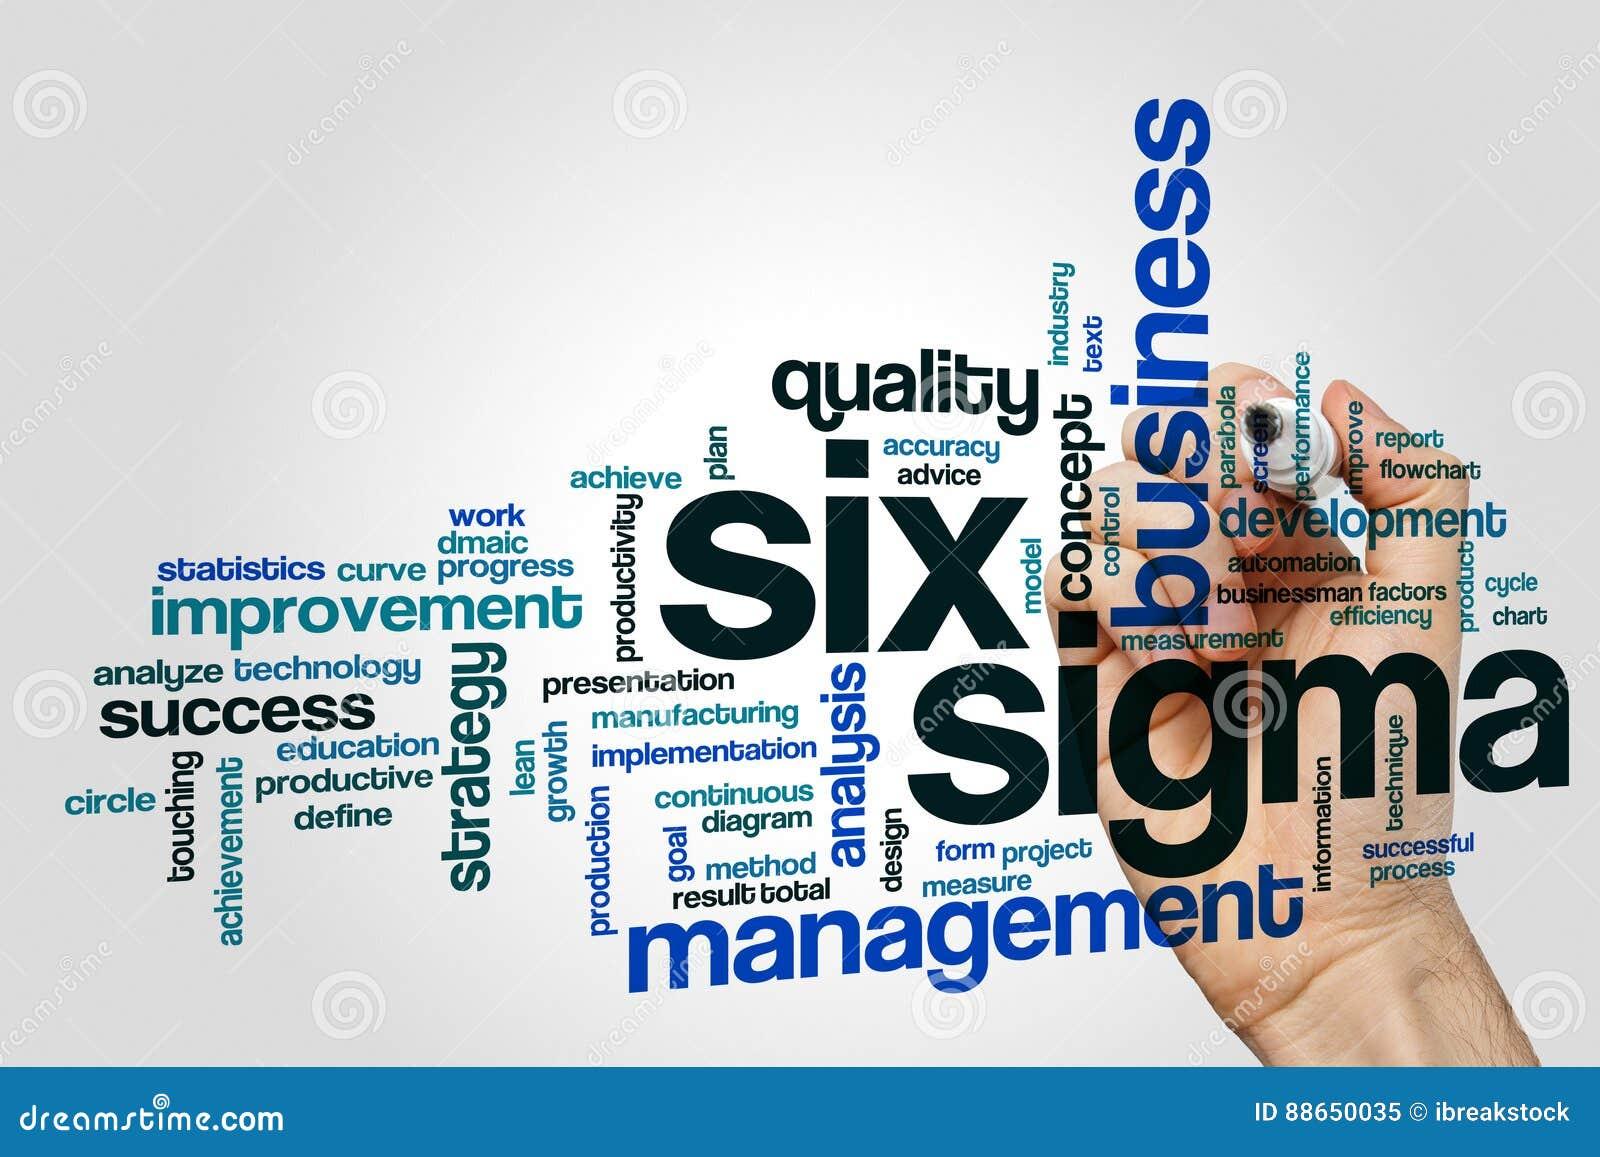 Six sigma word cloud stock image. Image of circle ...